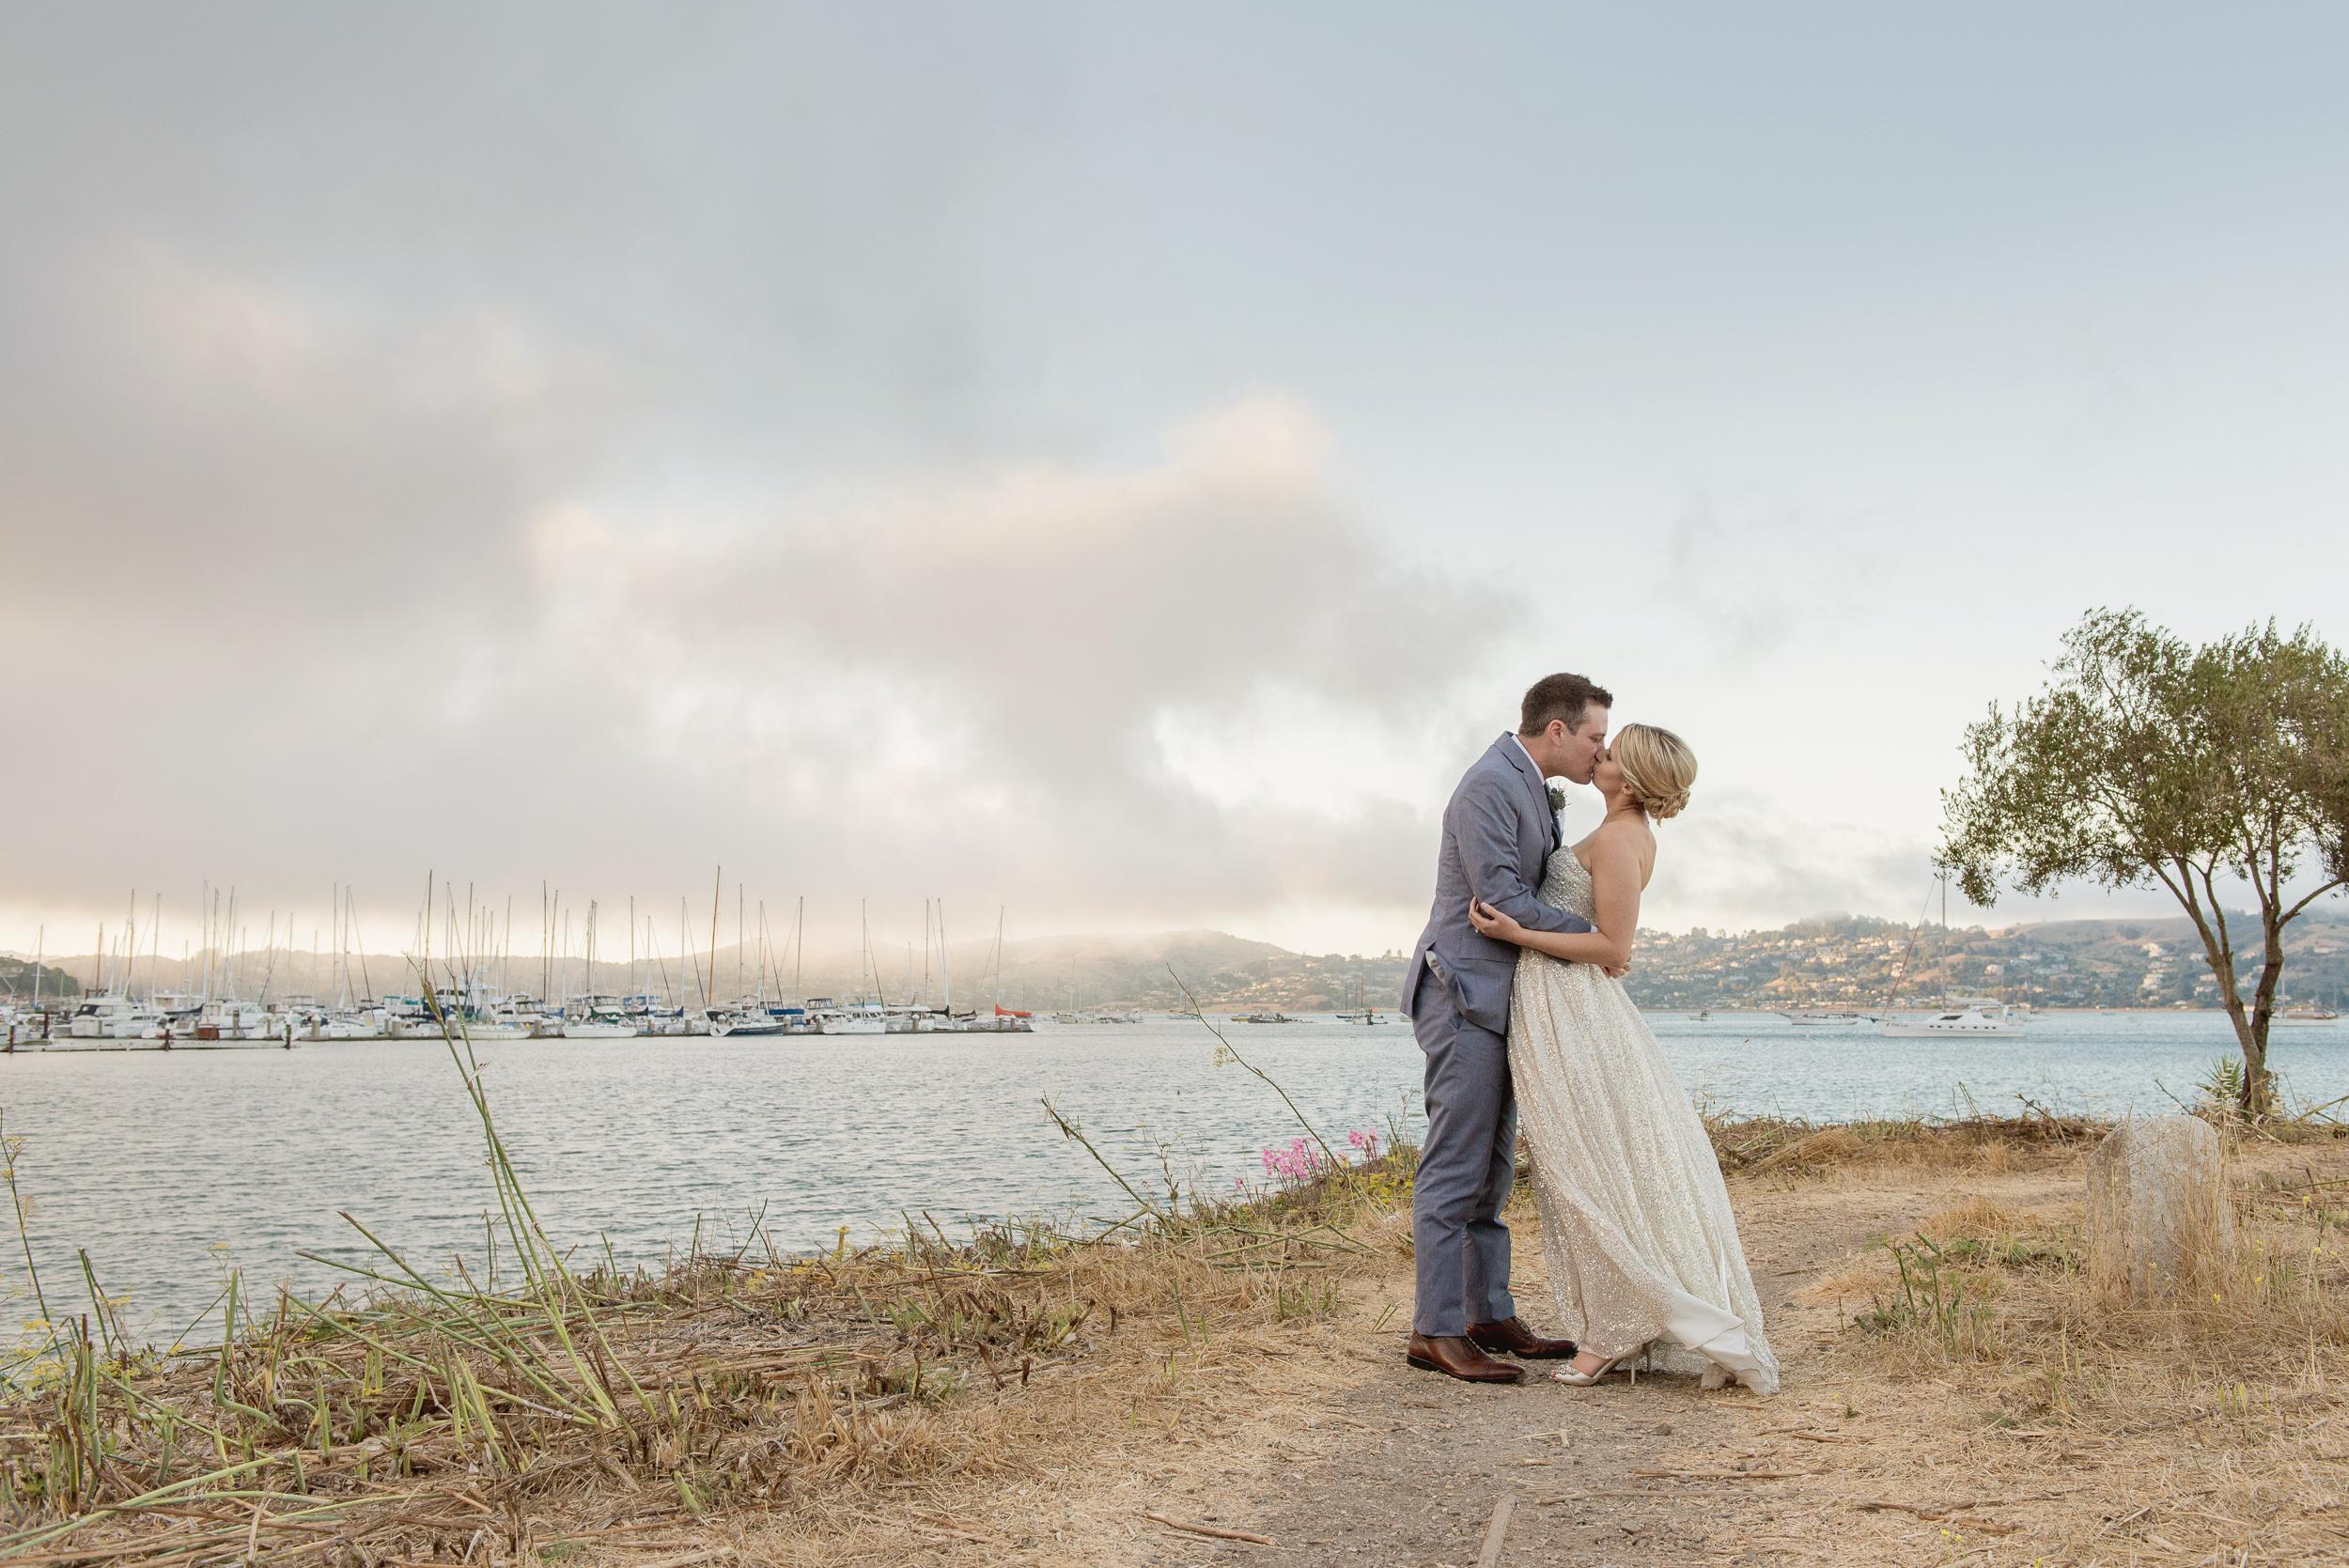 studio-333-sausalito-wedding-photographer-vc44.jpg